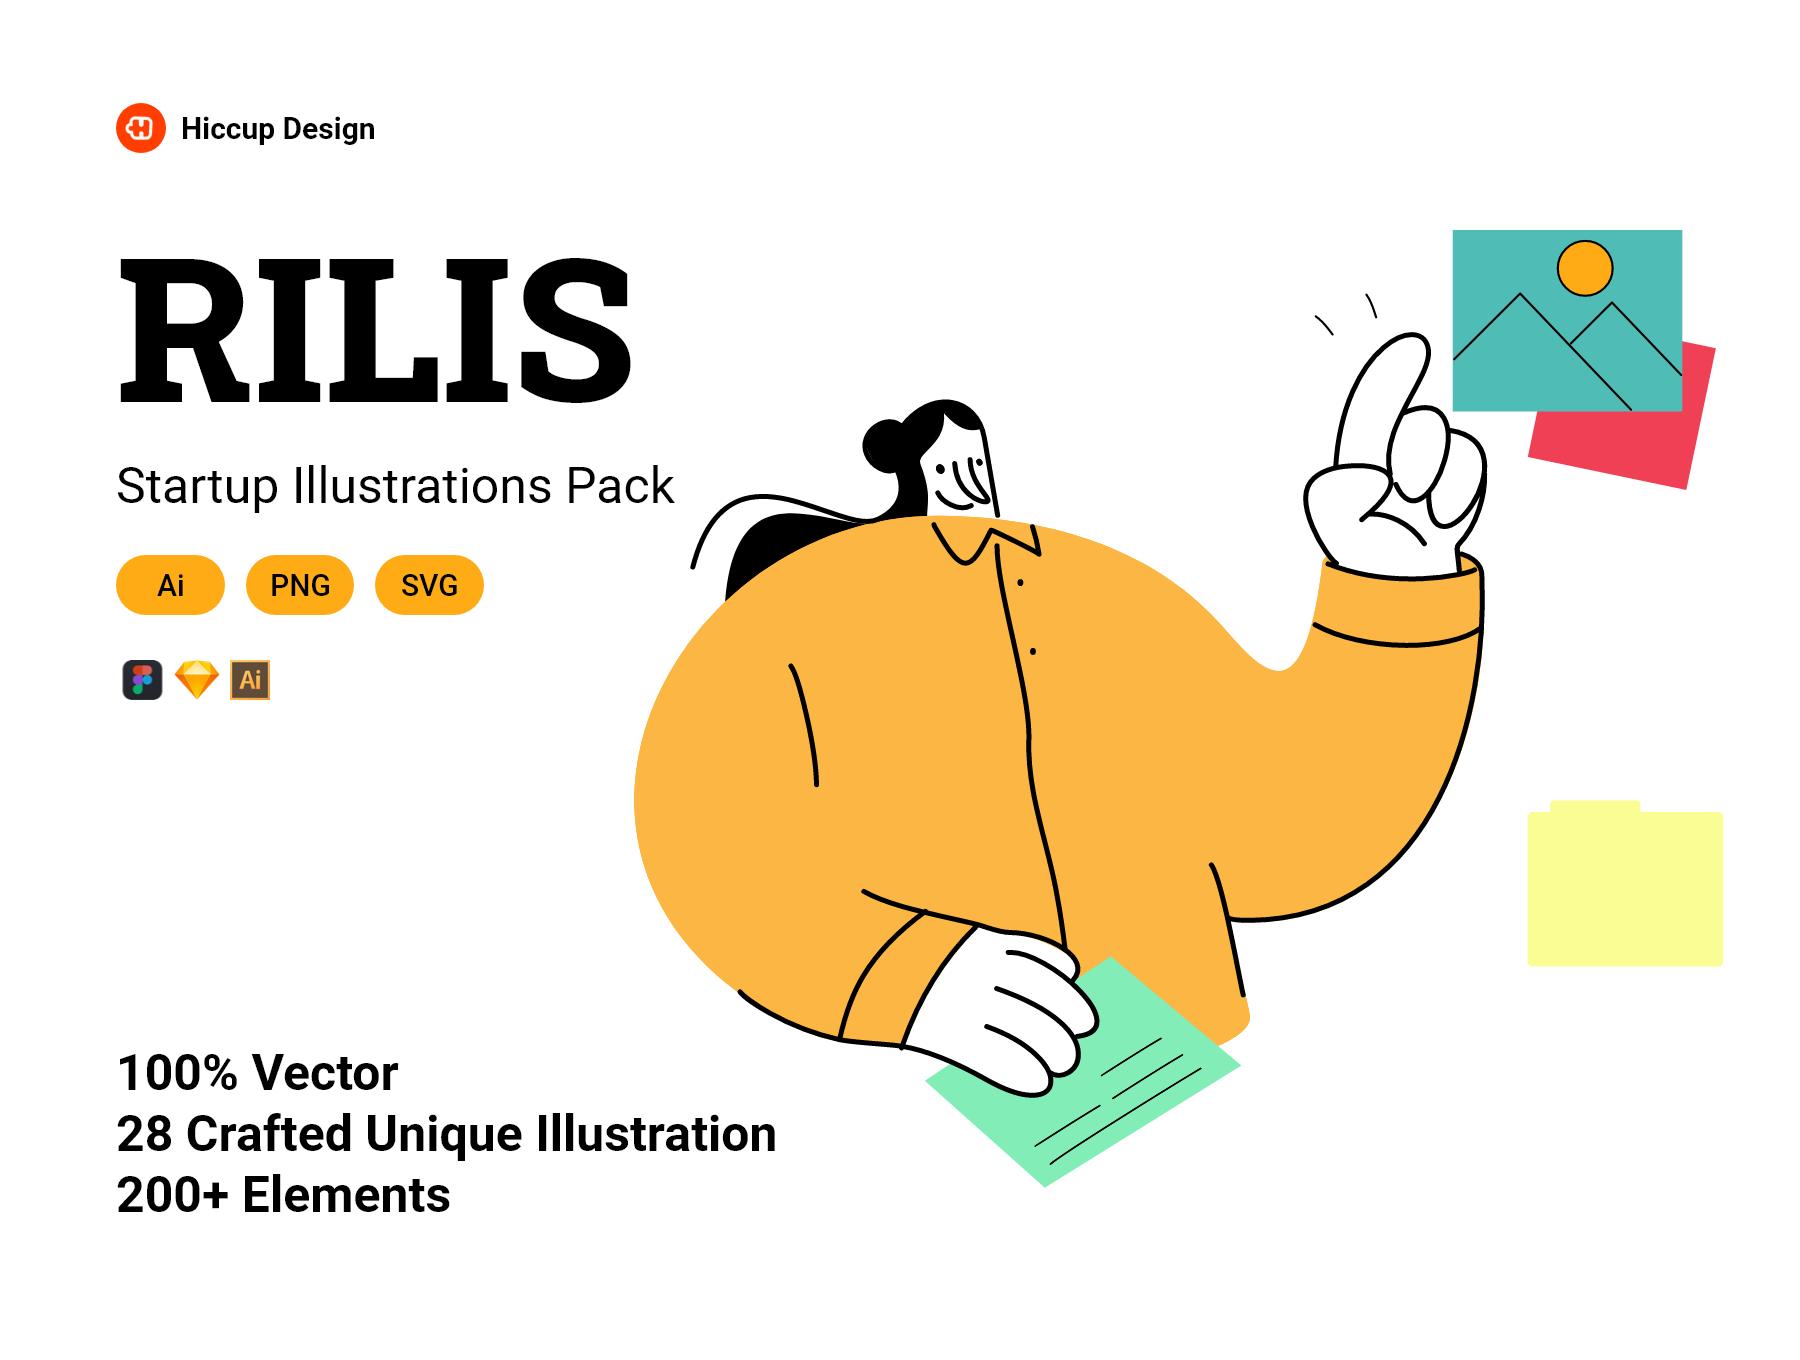 RilisStartup Illustrations Pack Premium illustrations for